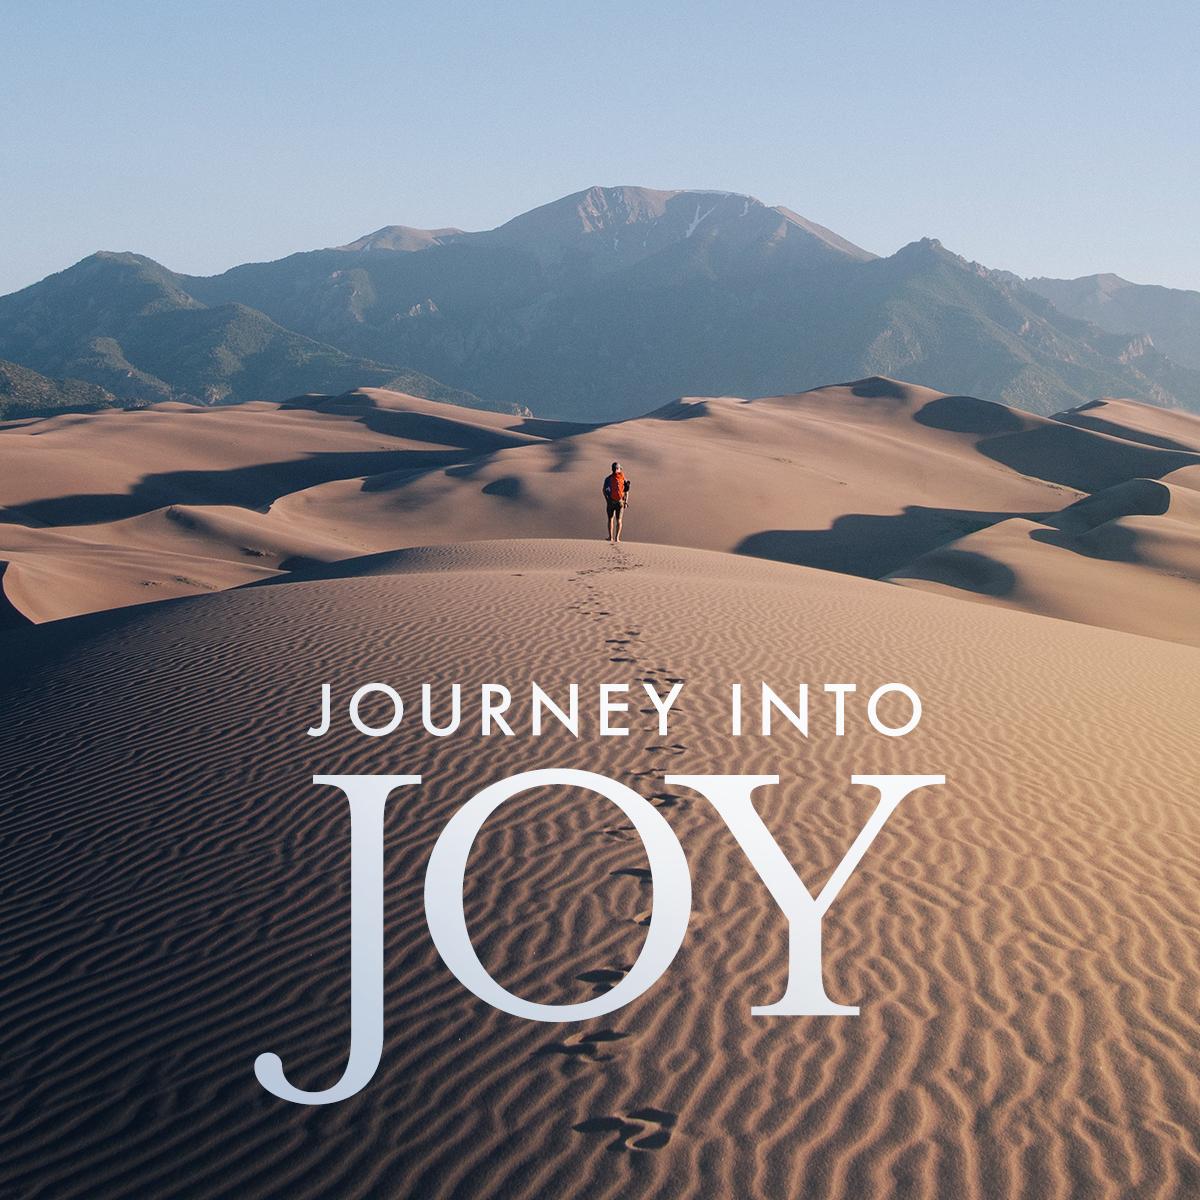 26-journey-into-joy.jpg